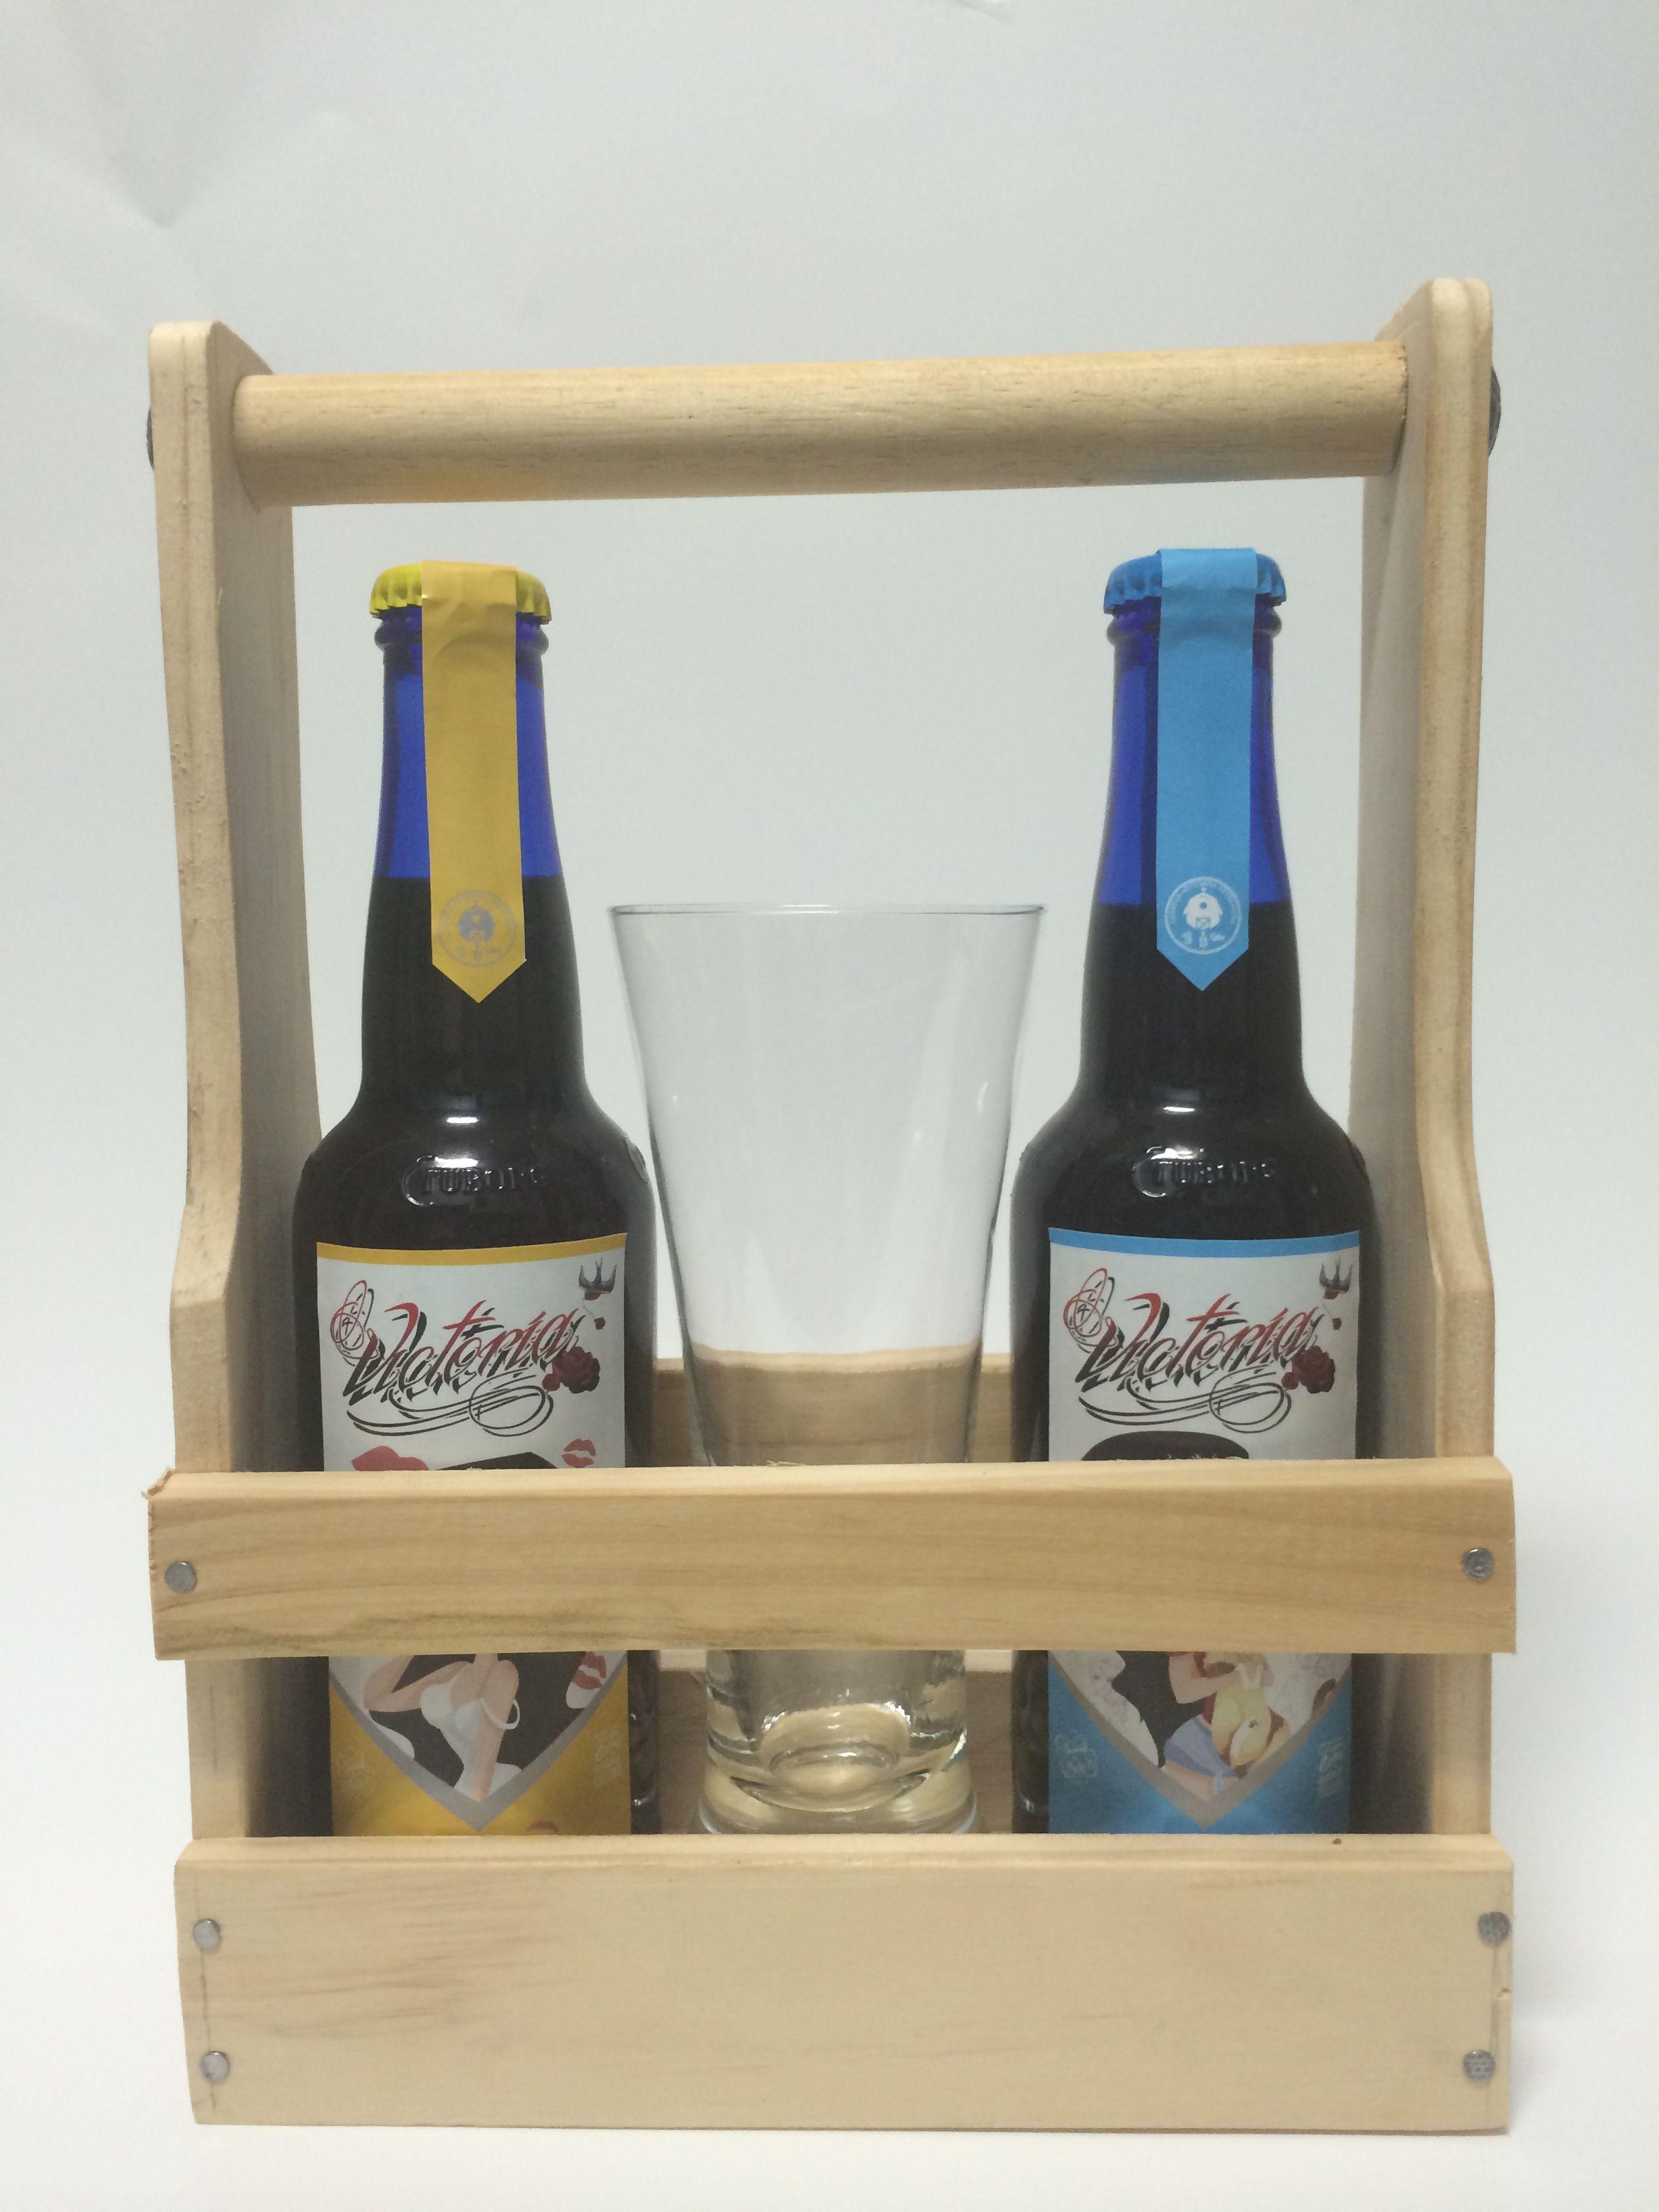 Cerveza Castua Edicion Especial Victoria Caja De Madera Copa Personalizada Y 2 Cervezas Castua Castua Beso Y Castua Abrazo